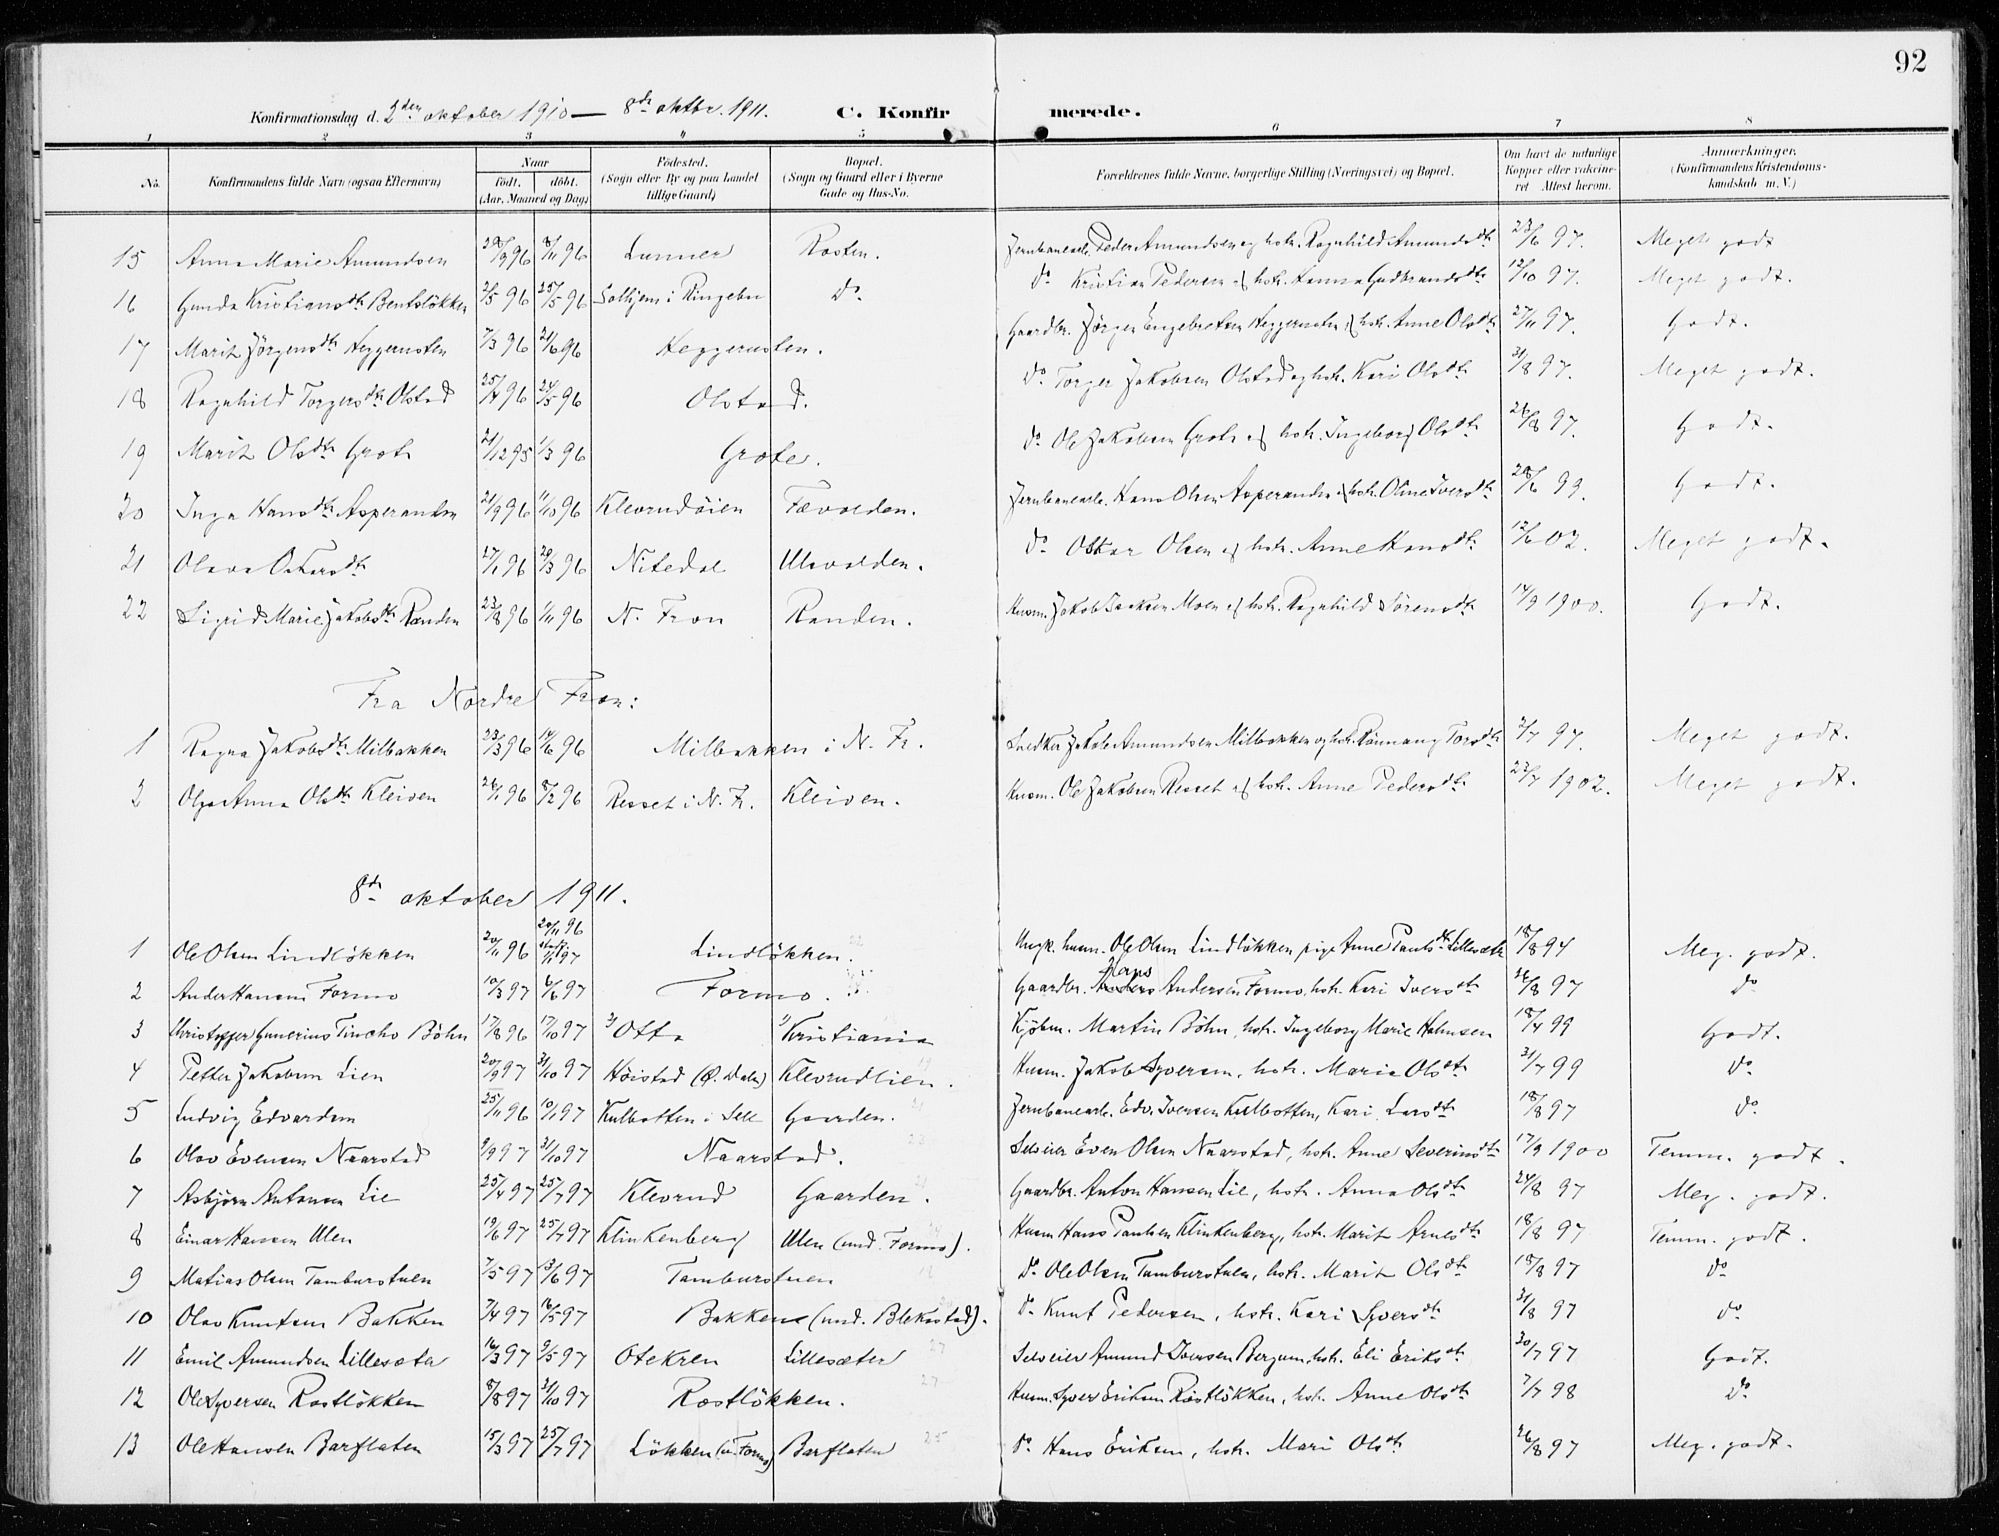 SAH, Sel prestekontor, Ministerialbok nr. 2, 1905-1919, s. 92